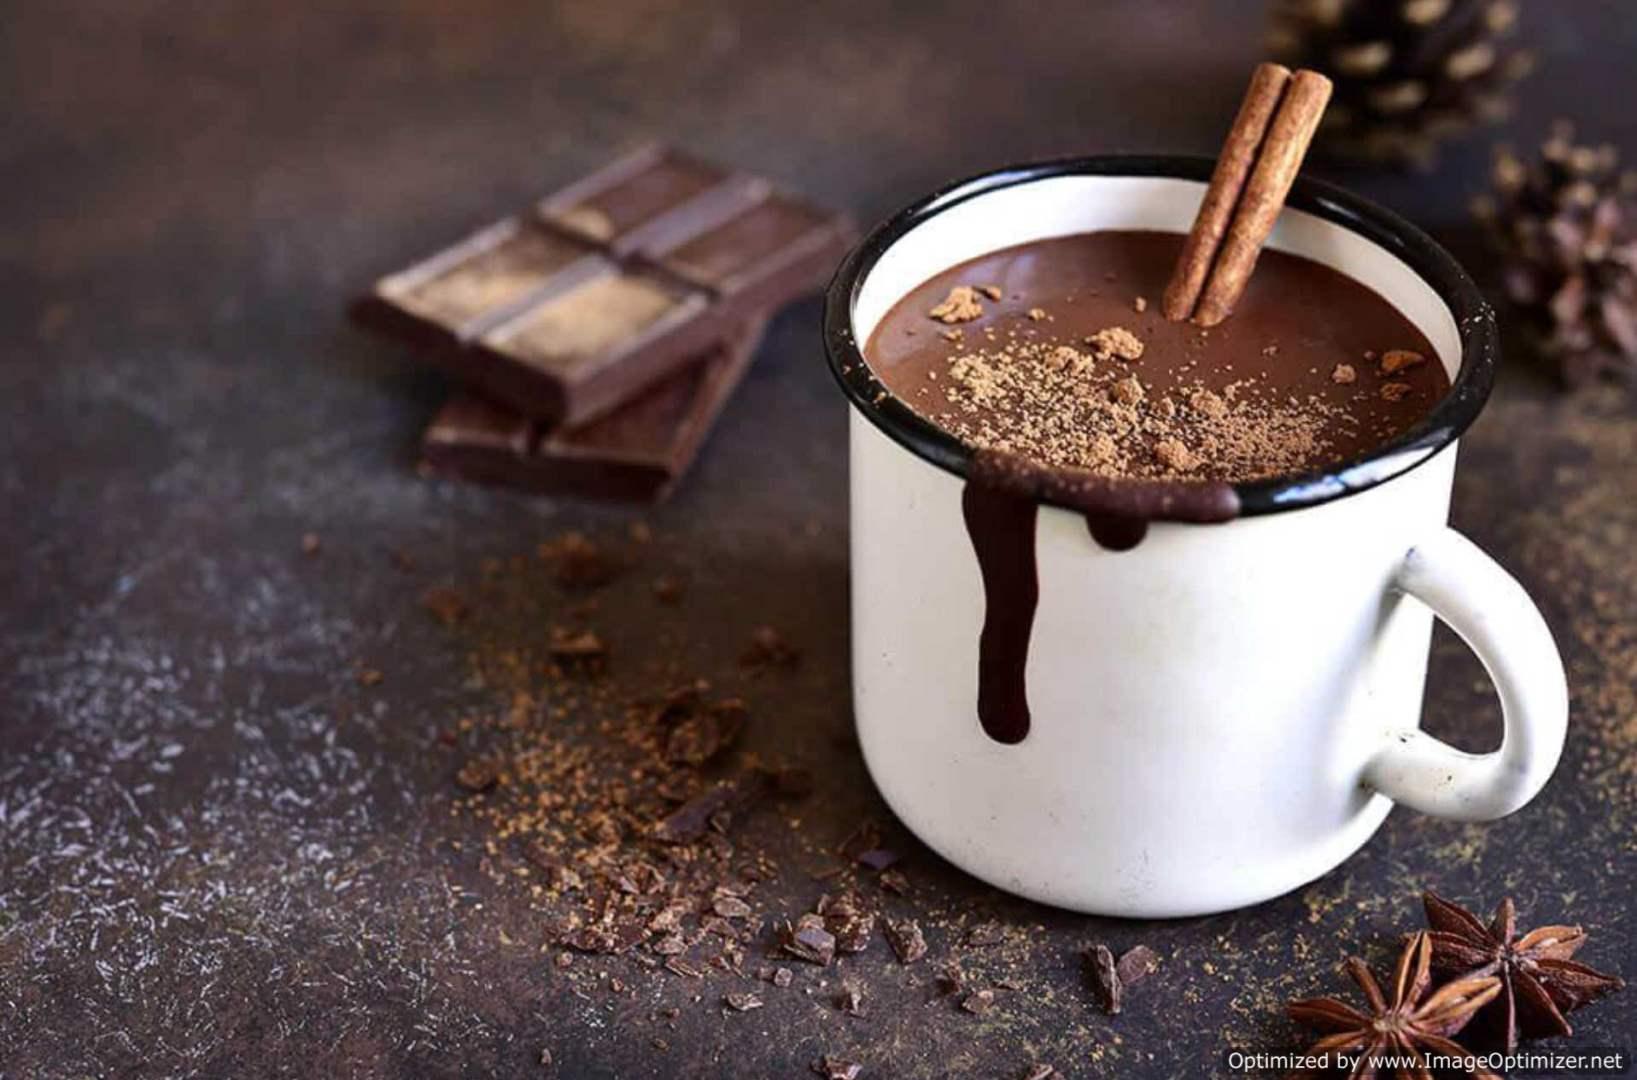 violet-tablet-milk-cocoa-product-5gr